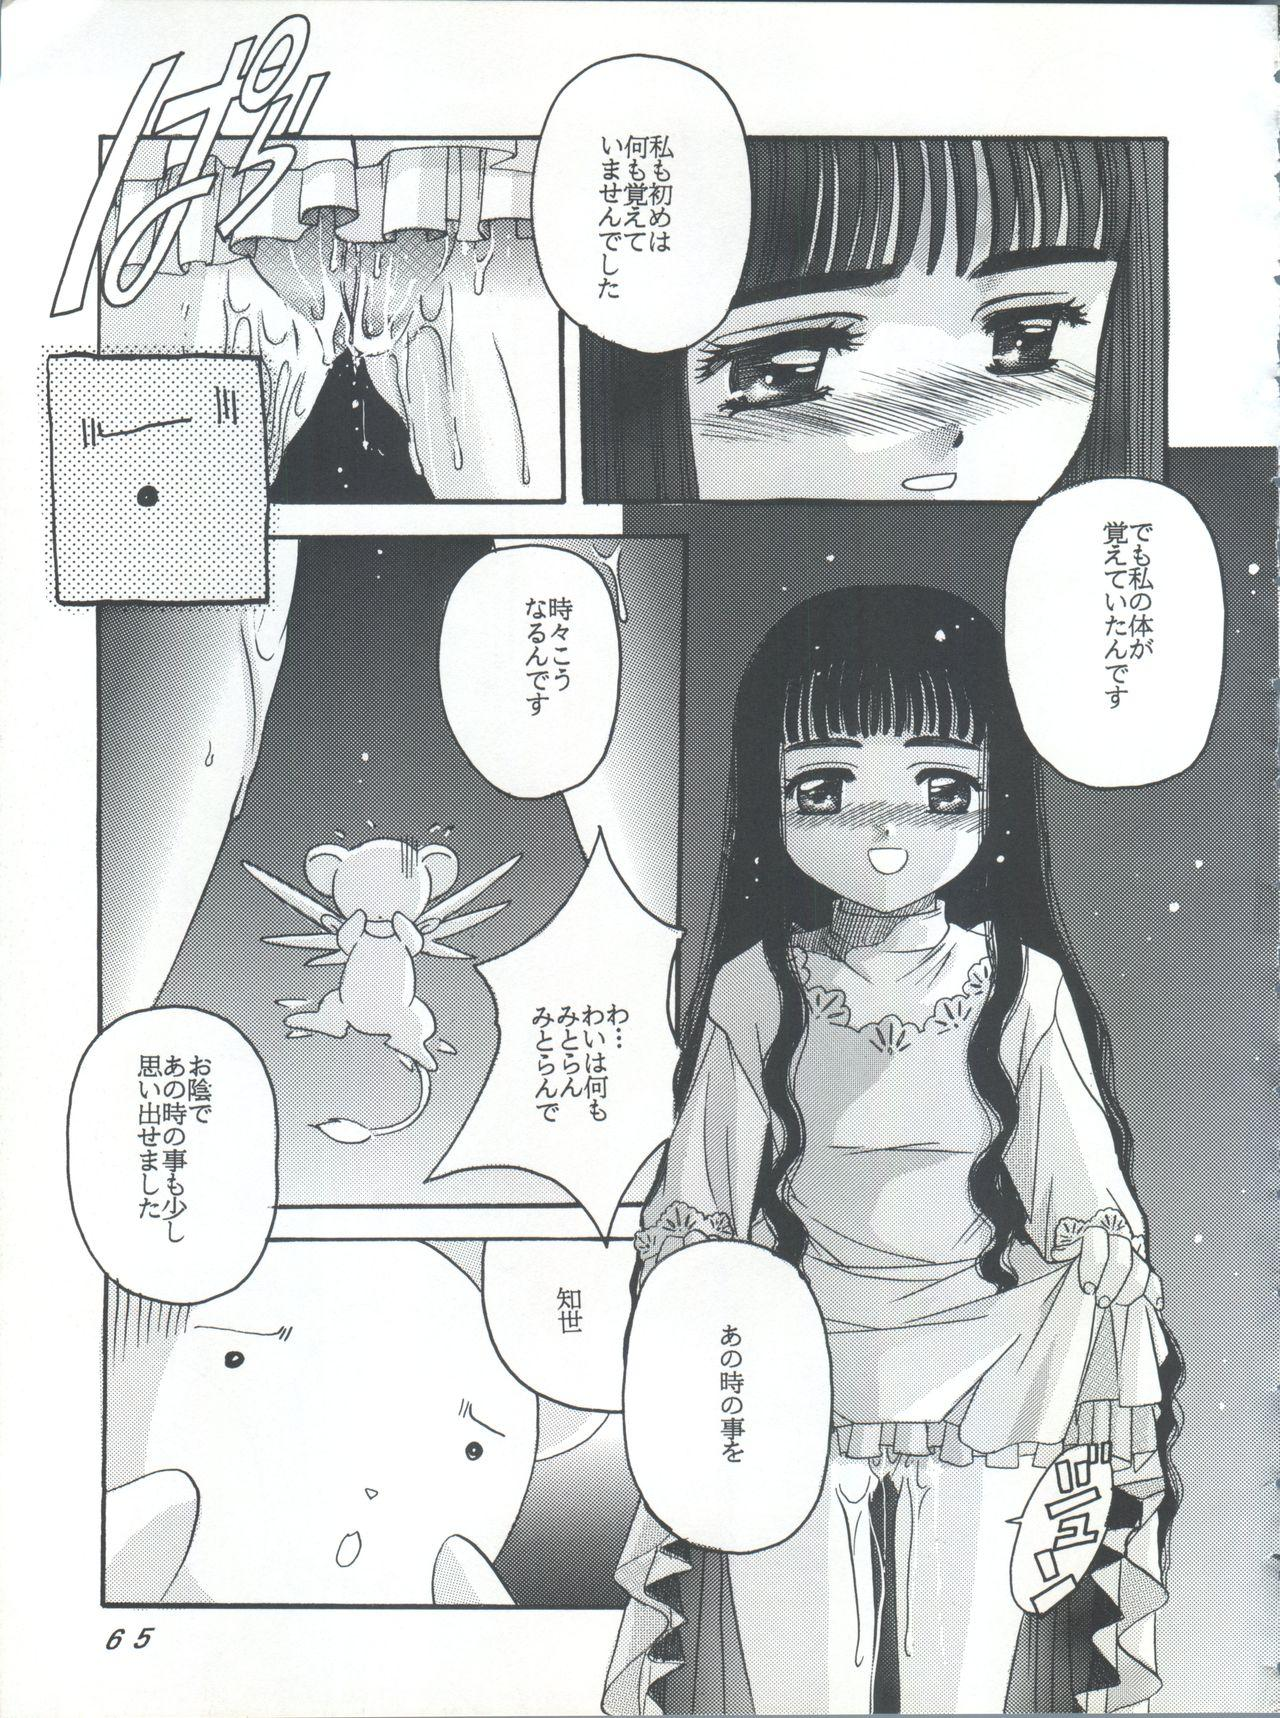 Card Captor Sakura Act 3 Green Version 63